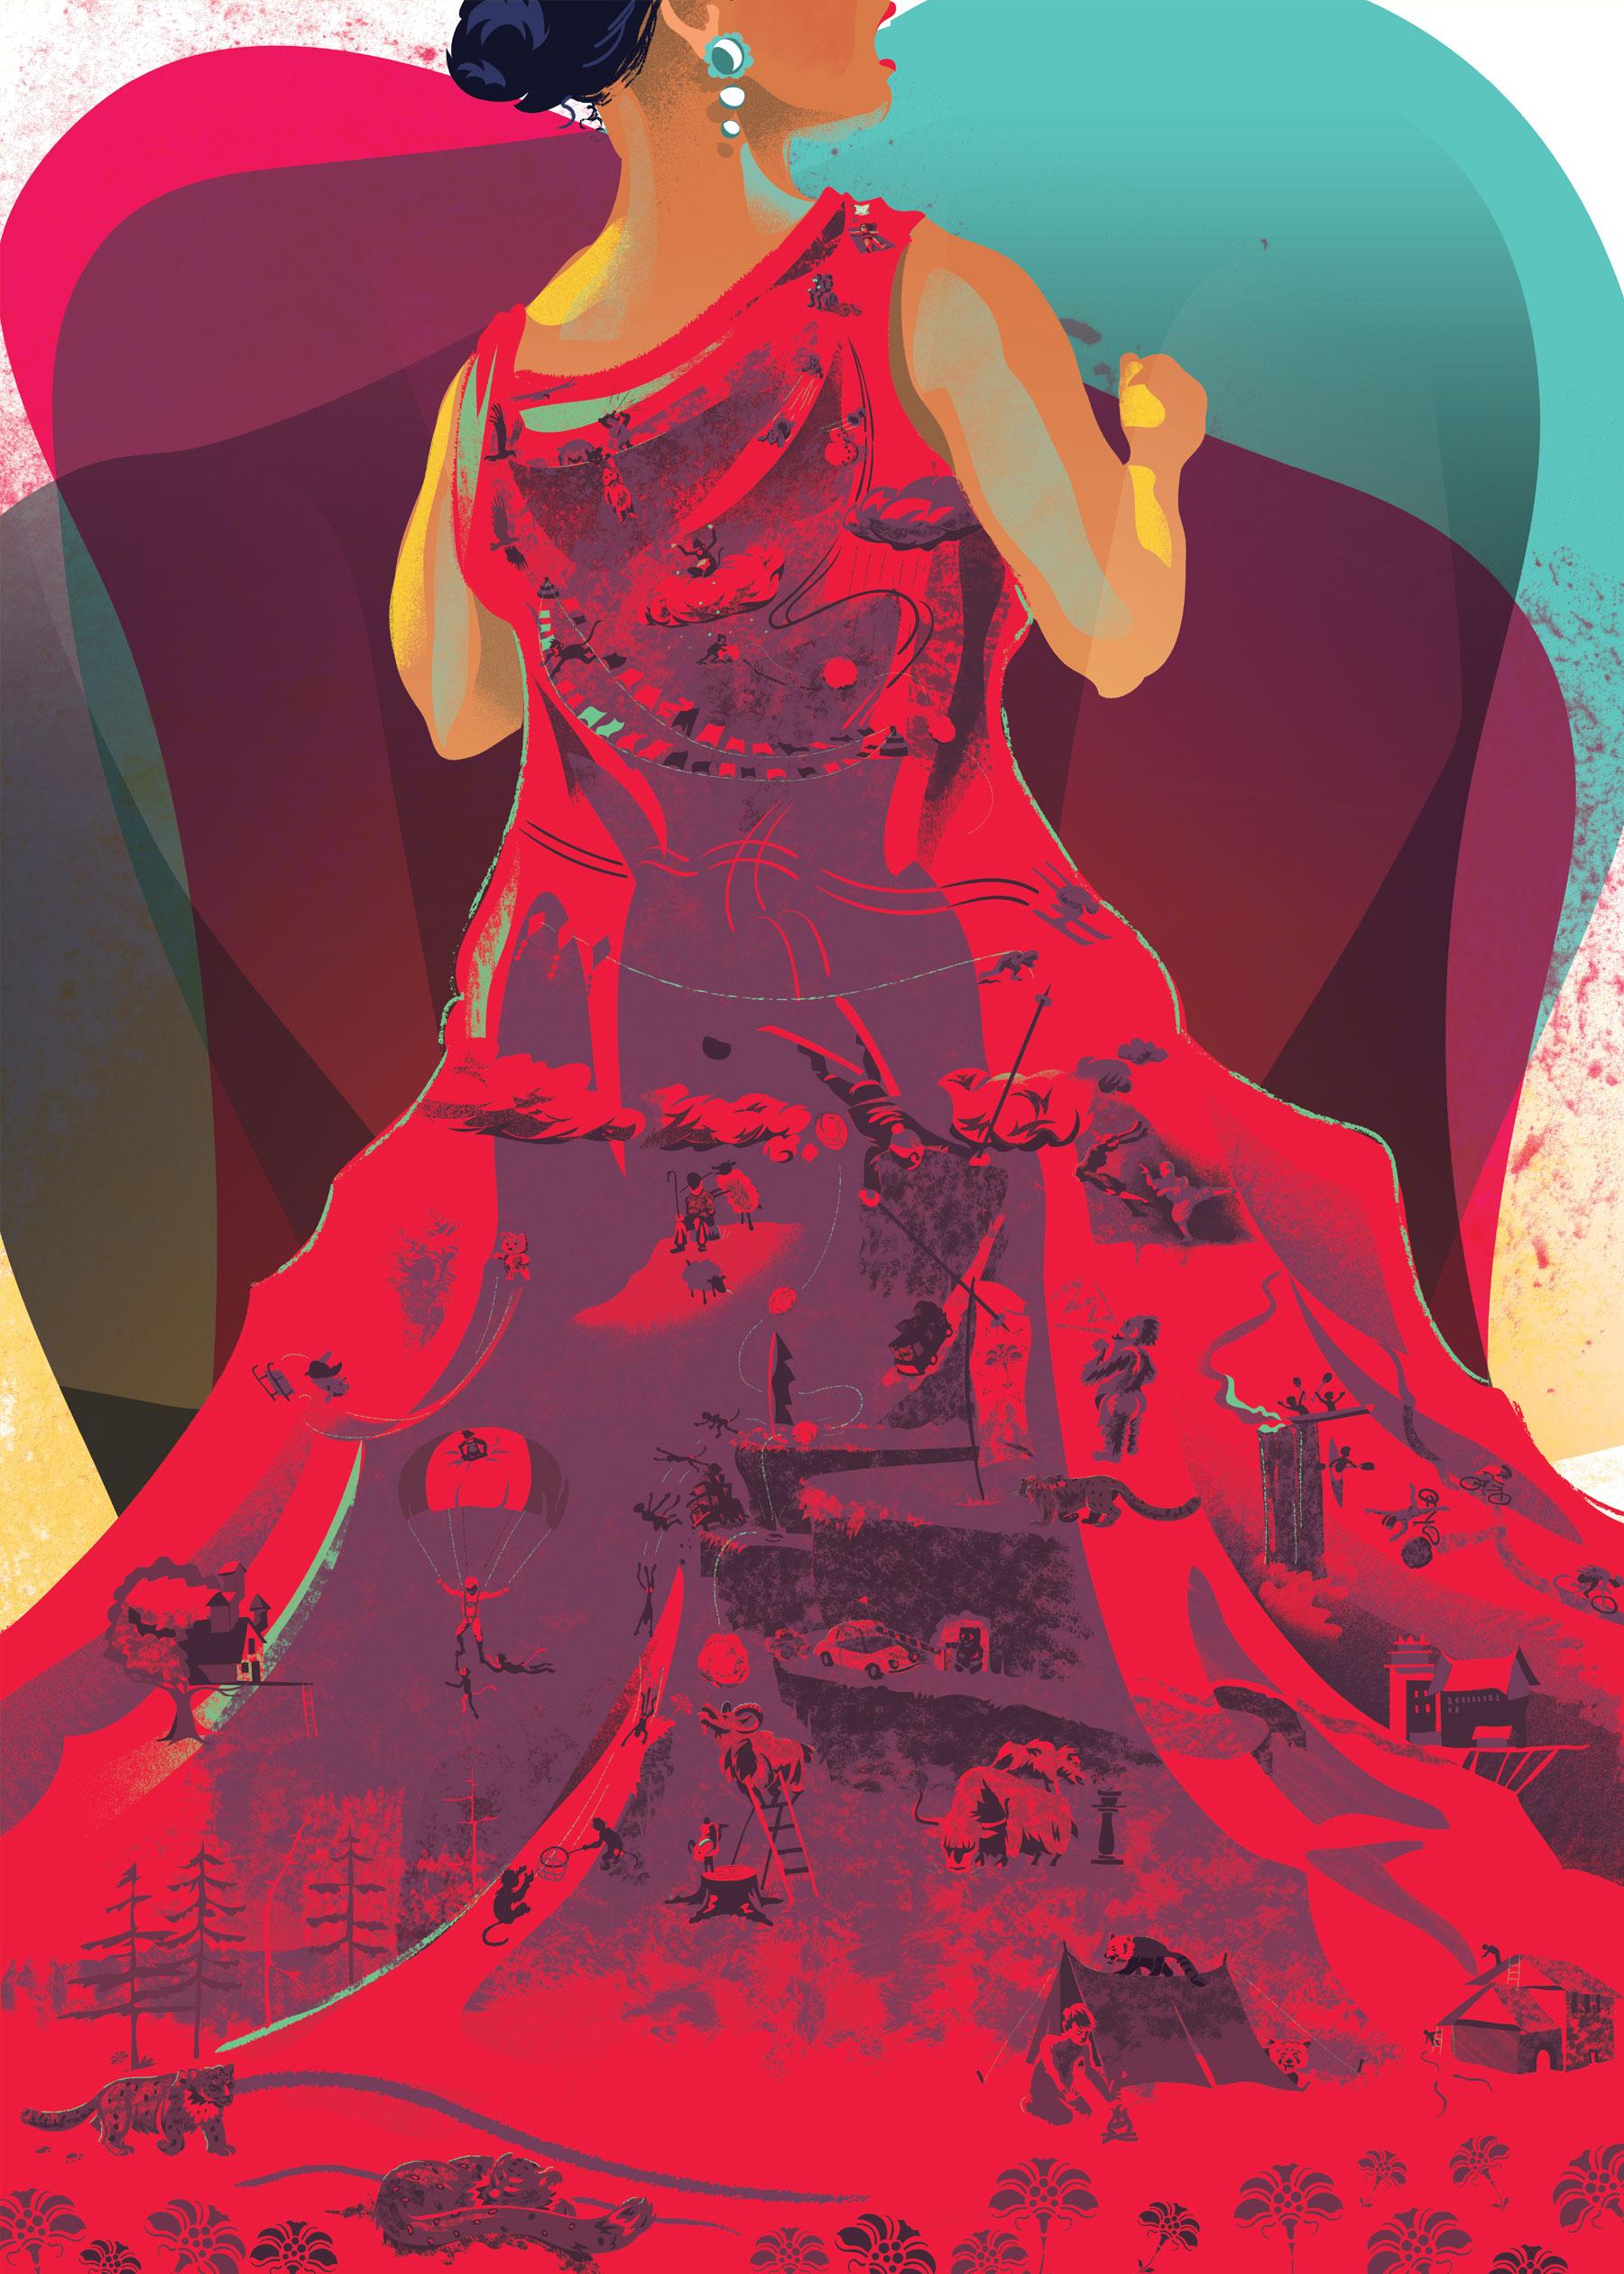 Detailed dress worn by an opera singer